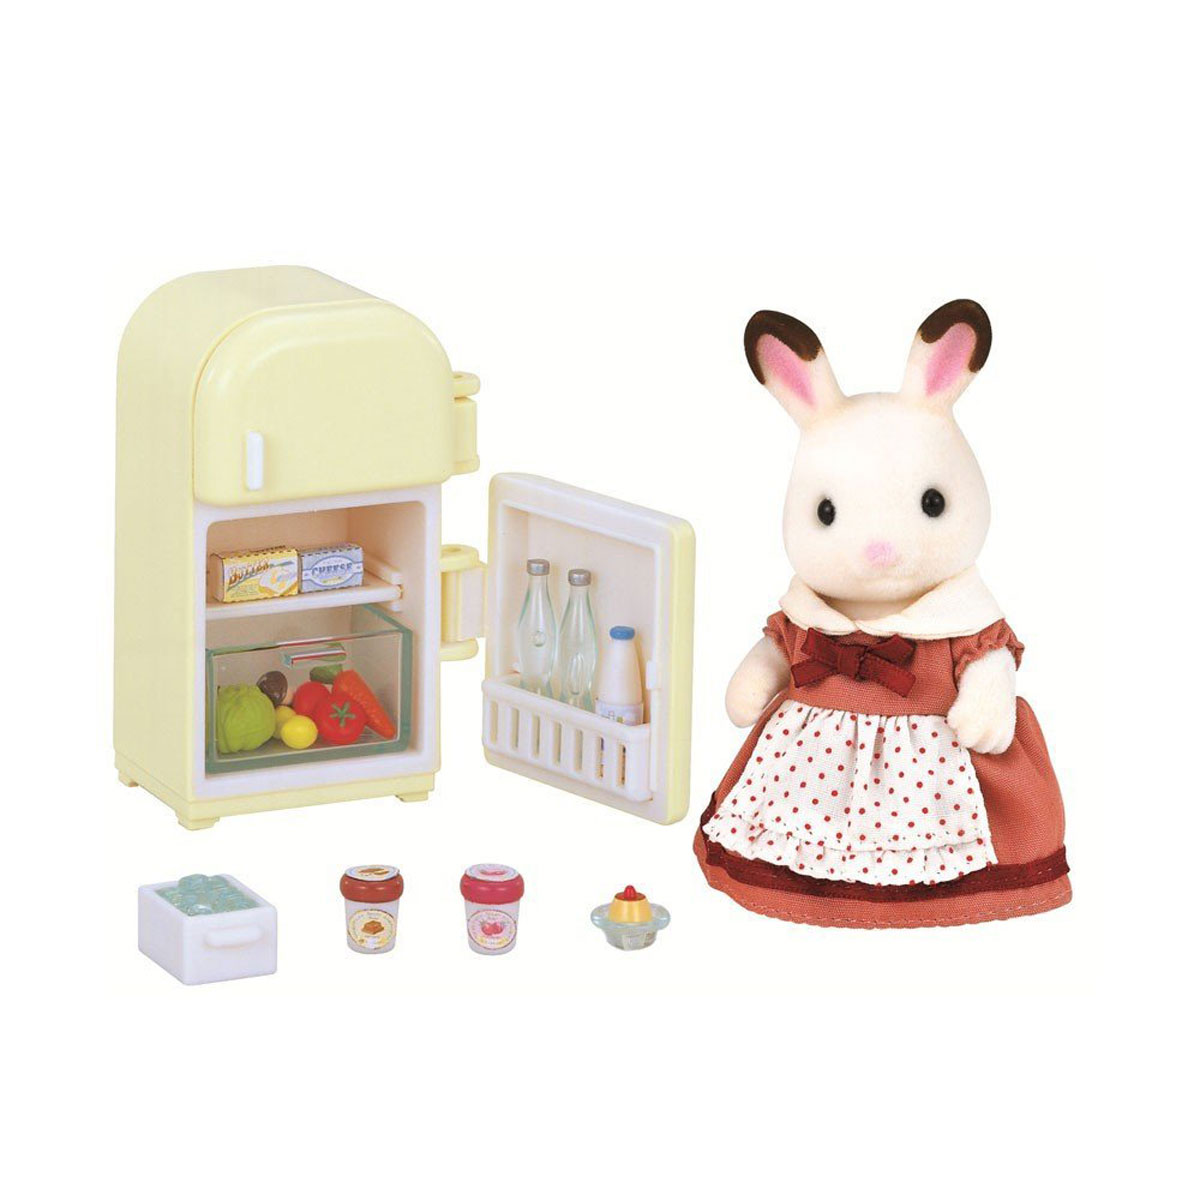 Sylvanian Families Набор фигурок Мама кролик и холодильник игровой набор sylvanian families мама кролик и холодильник 2202